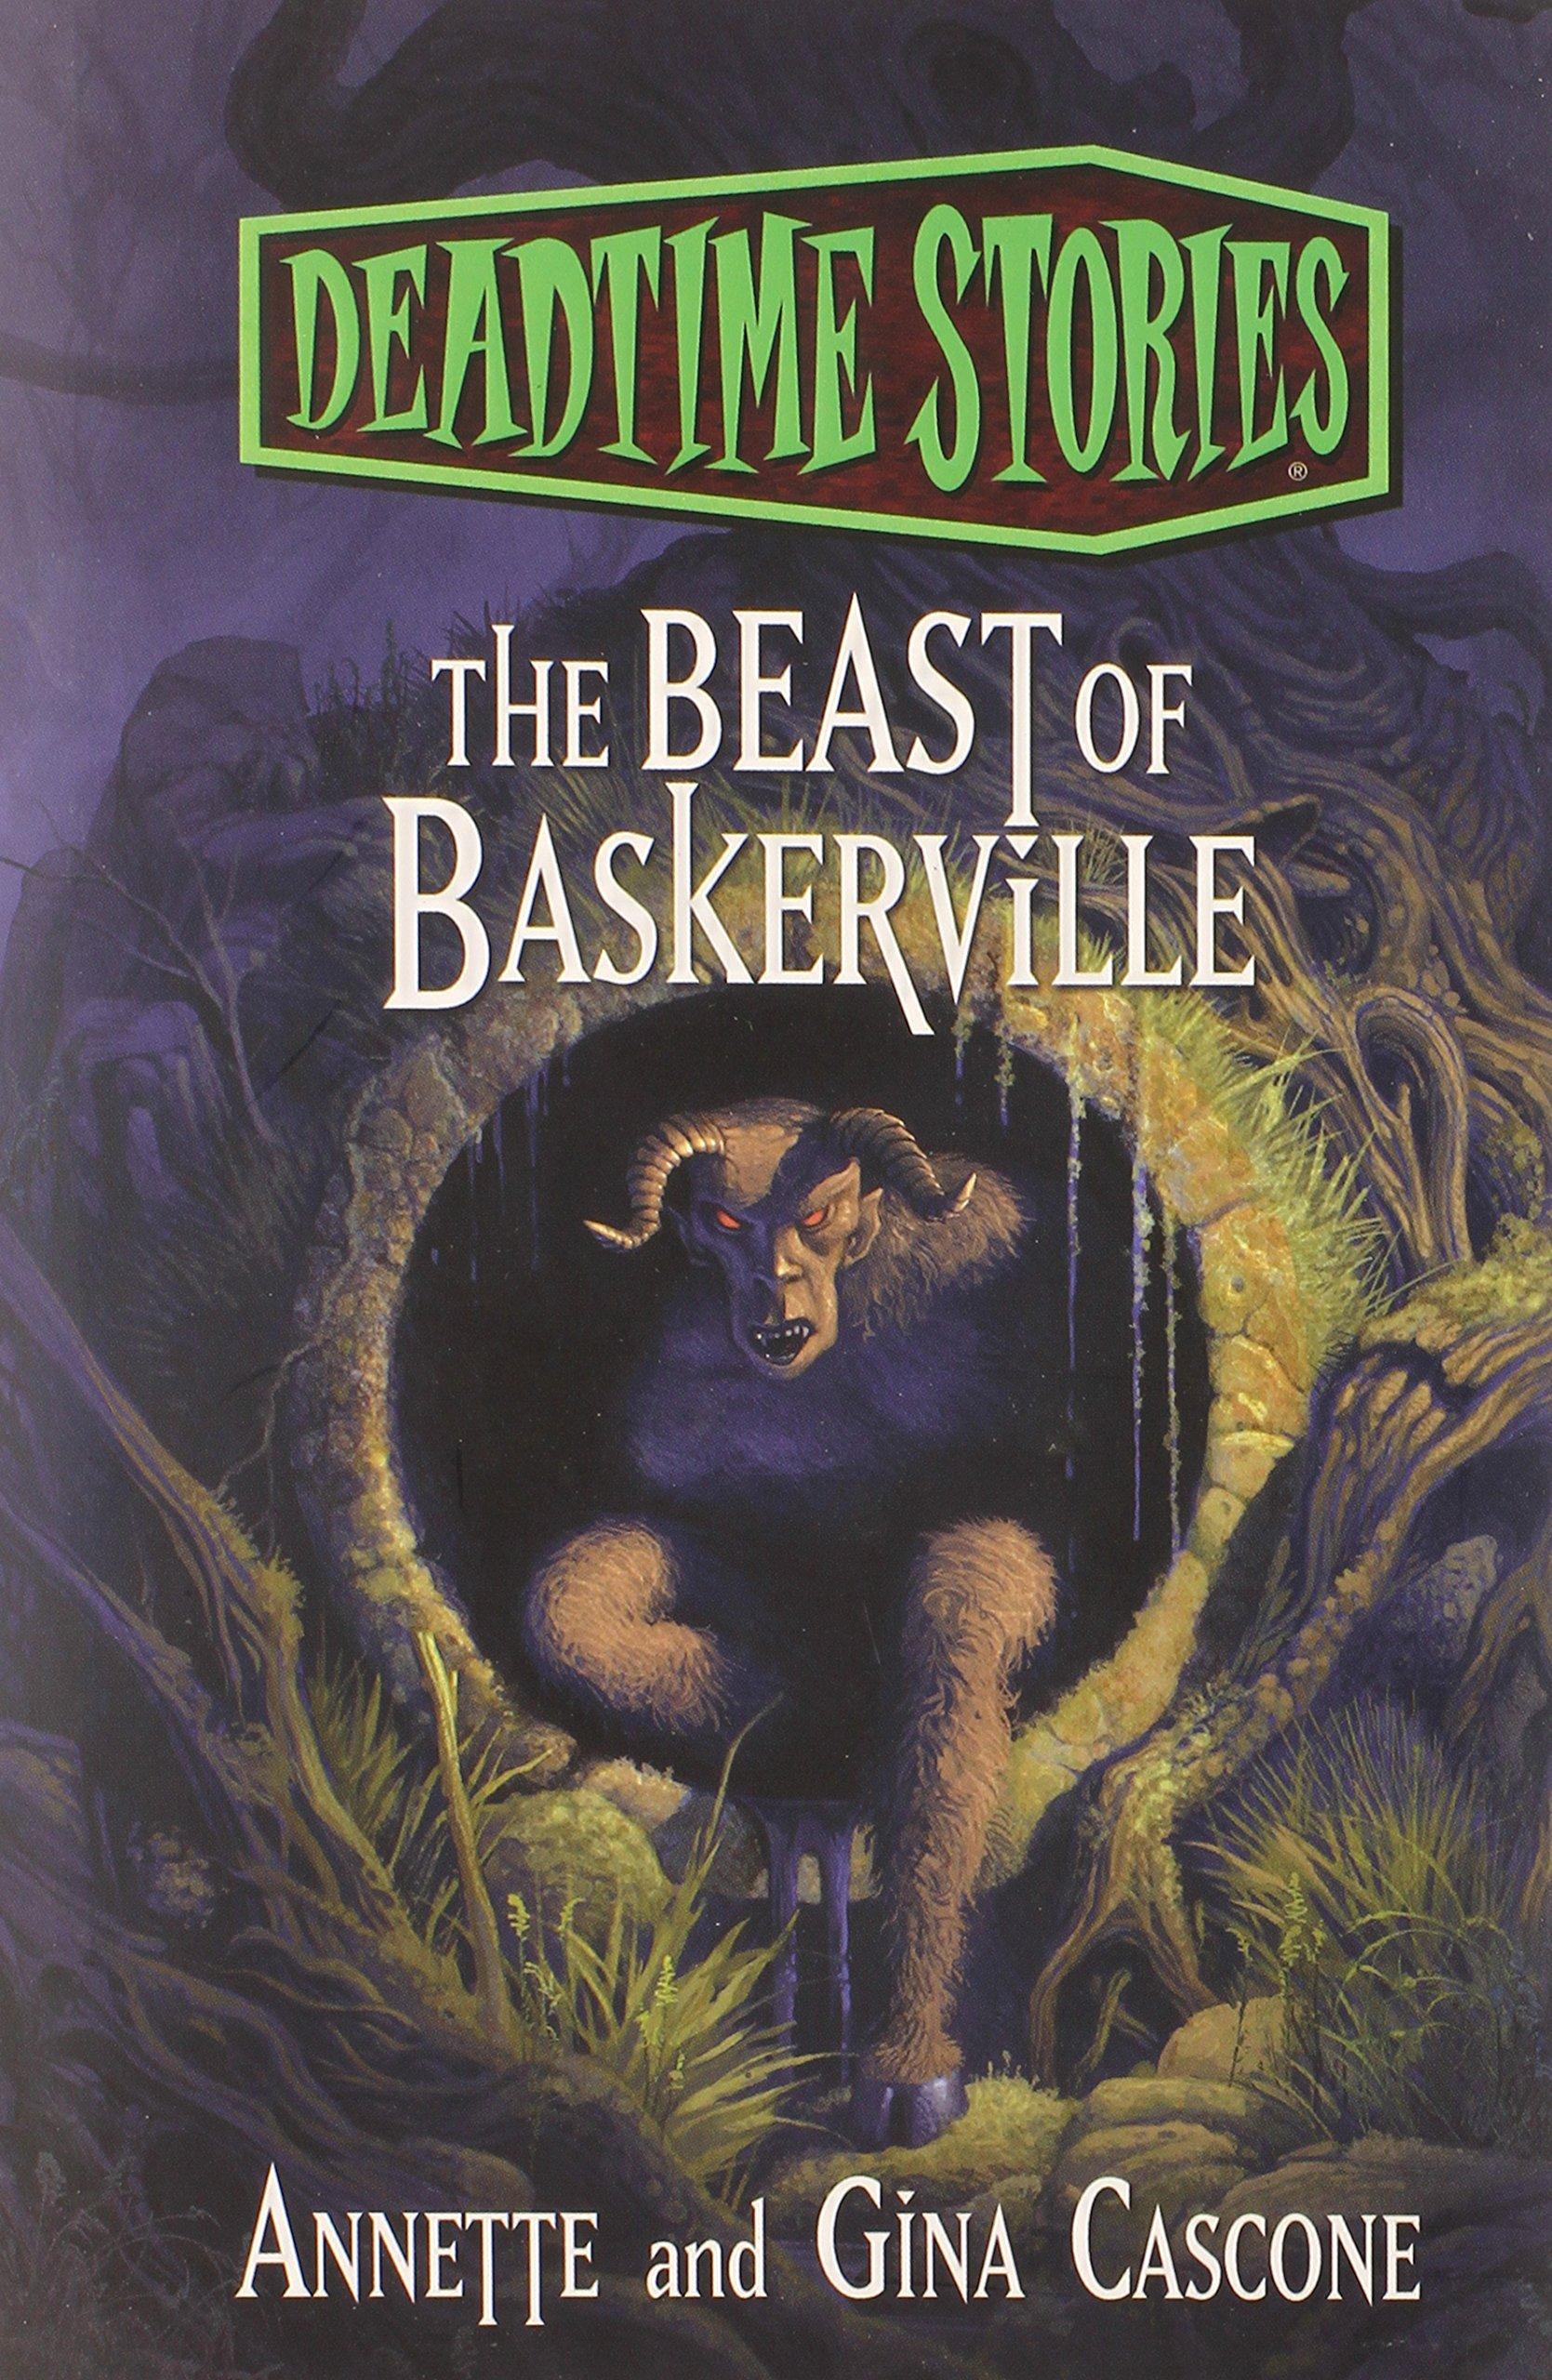 Deadtime Stories: The Beast of Baskerville ebook